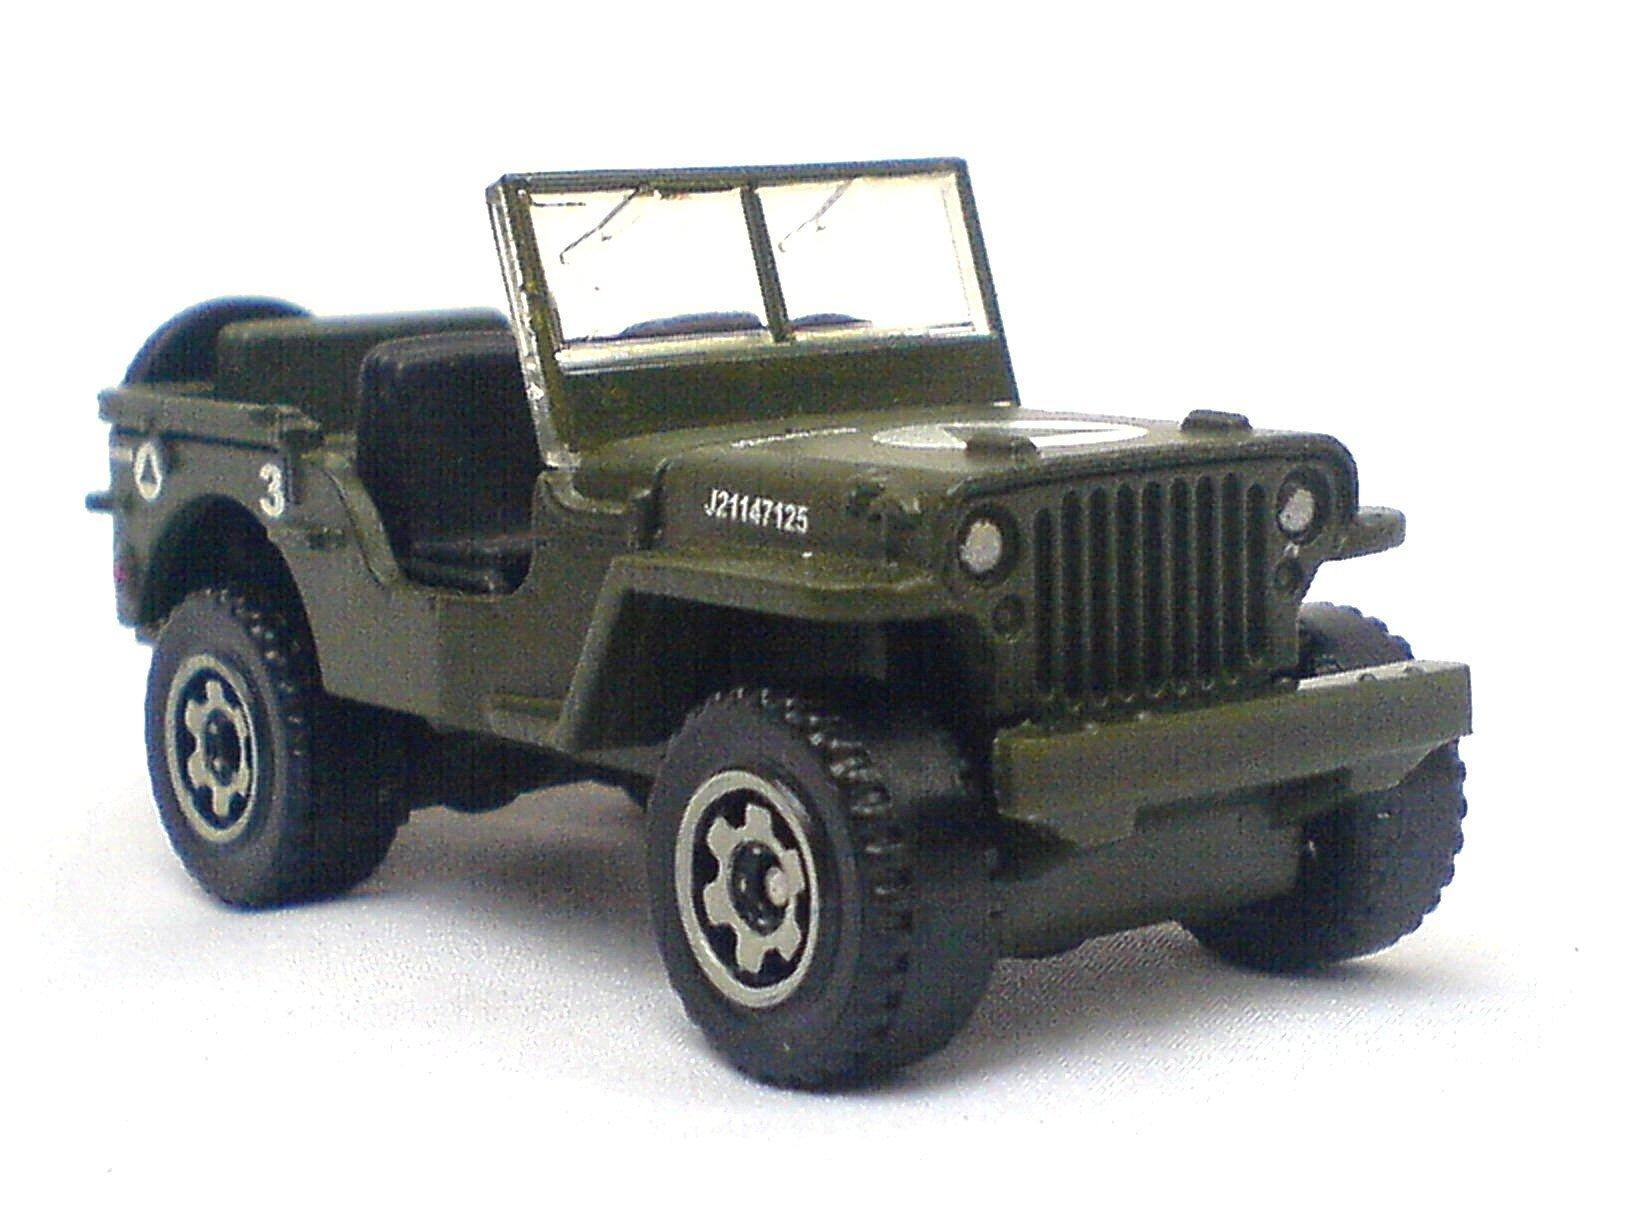 Image 2010 Jeep Willys B Jpg Matchbox Cars Wiki